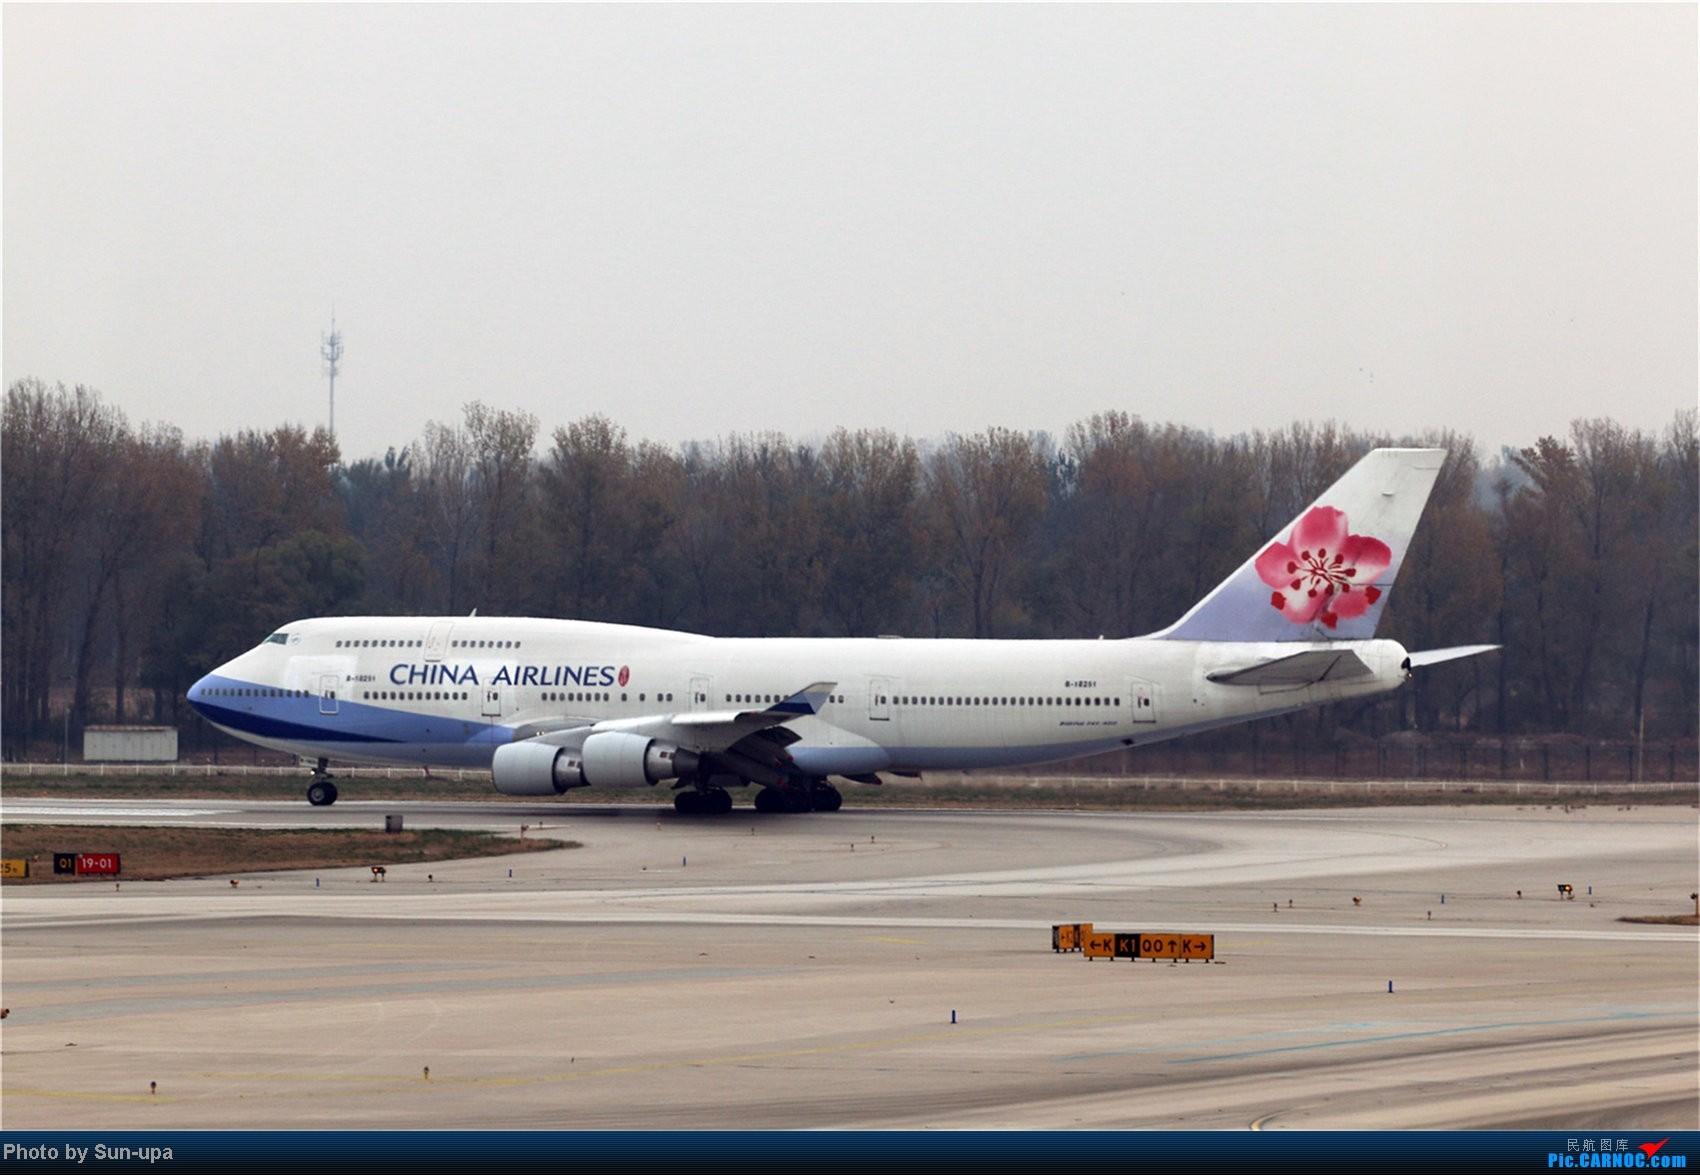 Re:[原创]【Sun-upa】老图新发 前段时间pek杂图+11.7机场内随拍 BOEING 747-400 B-18251 中国北京首都机场